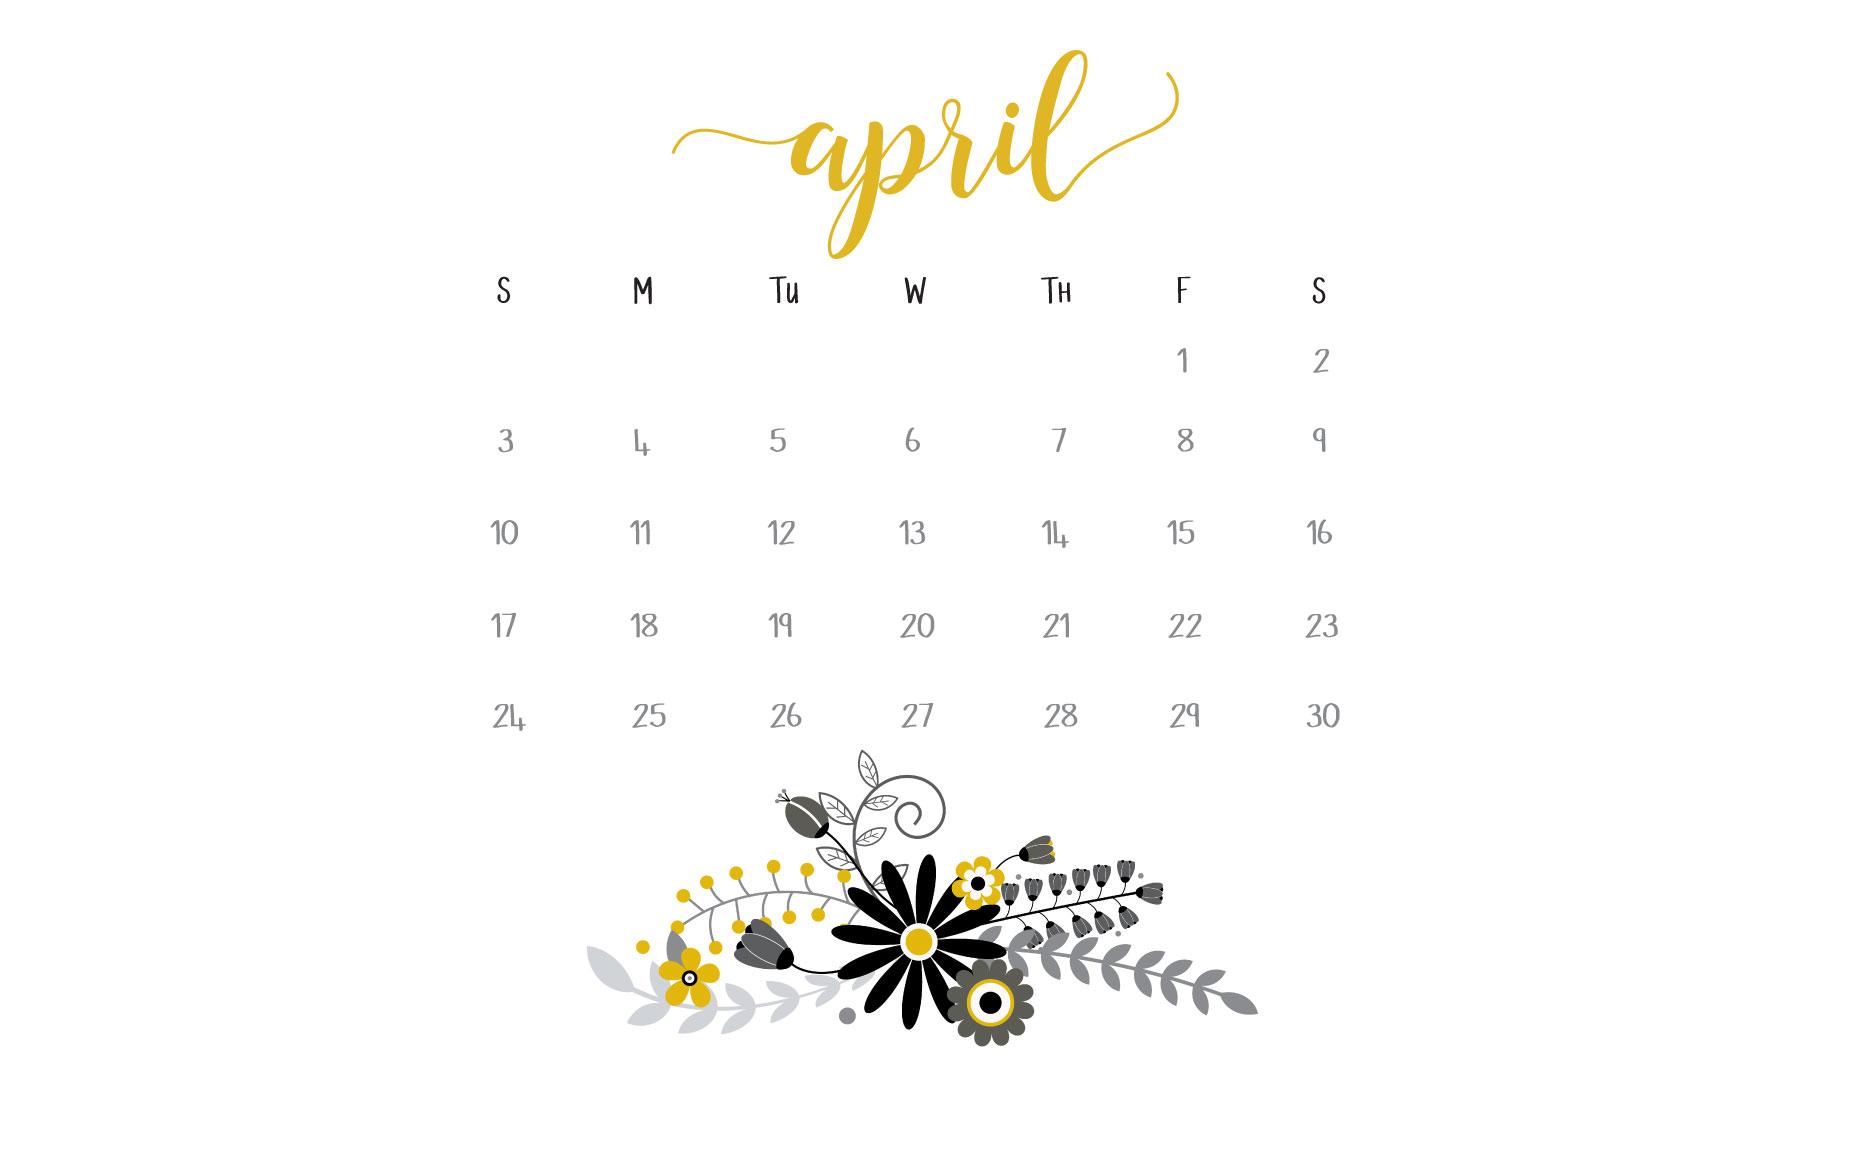 April 2016 Calendar Printables and Freebies 1856x1151